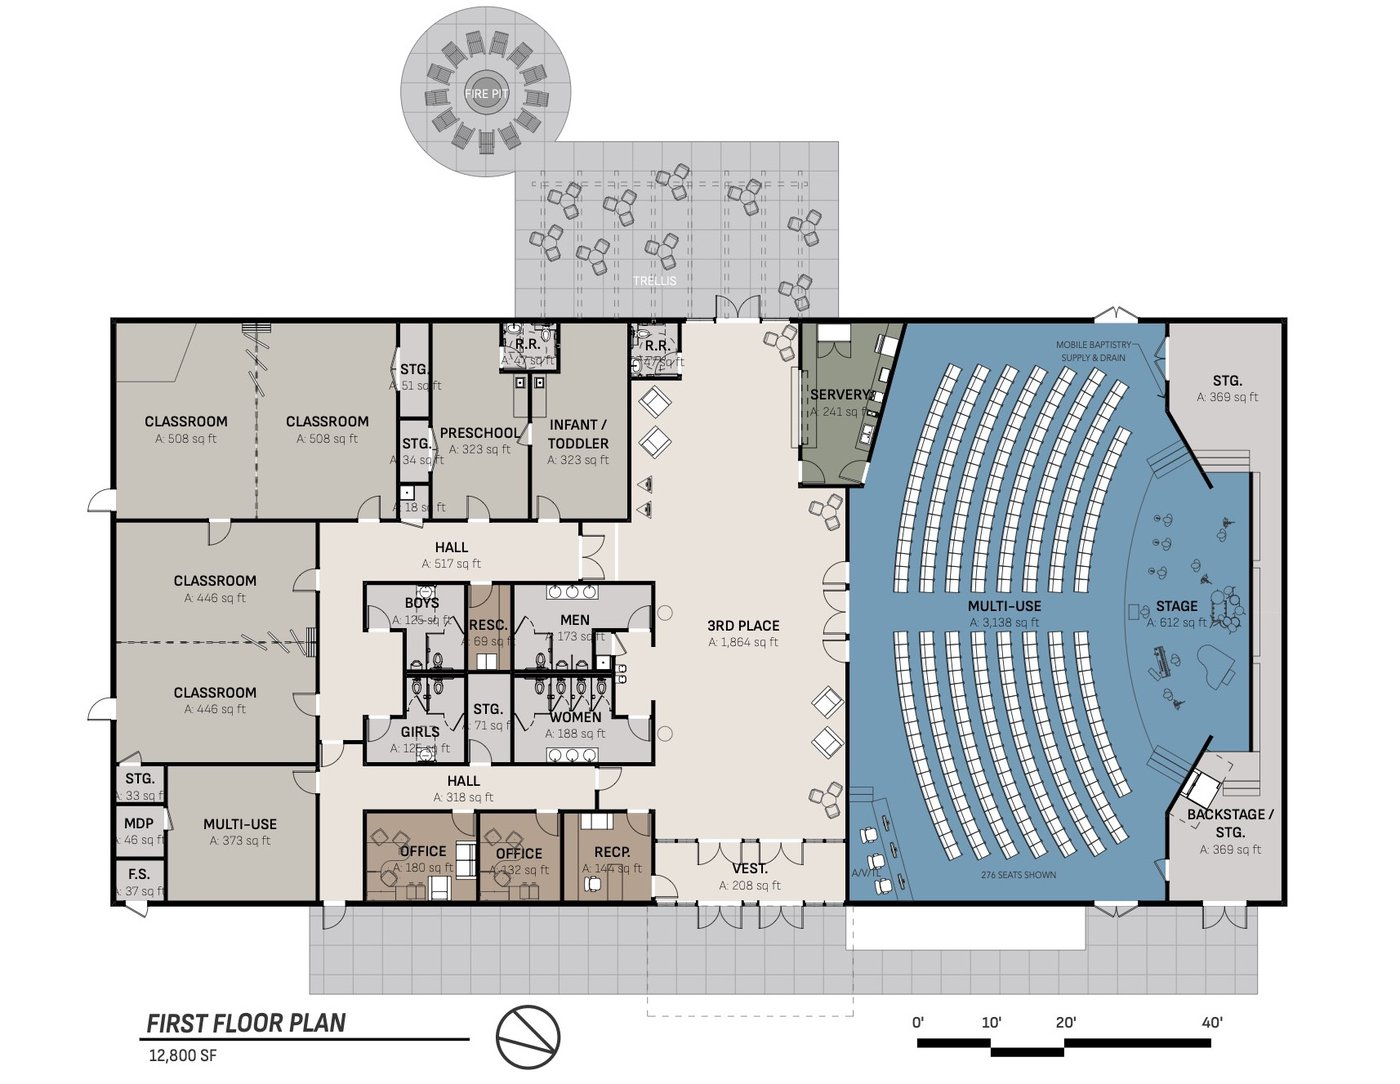 Concept interior of building